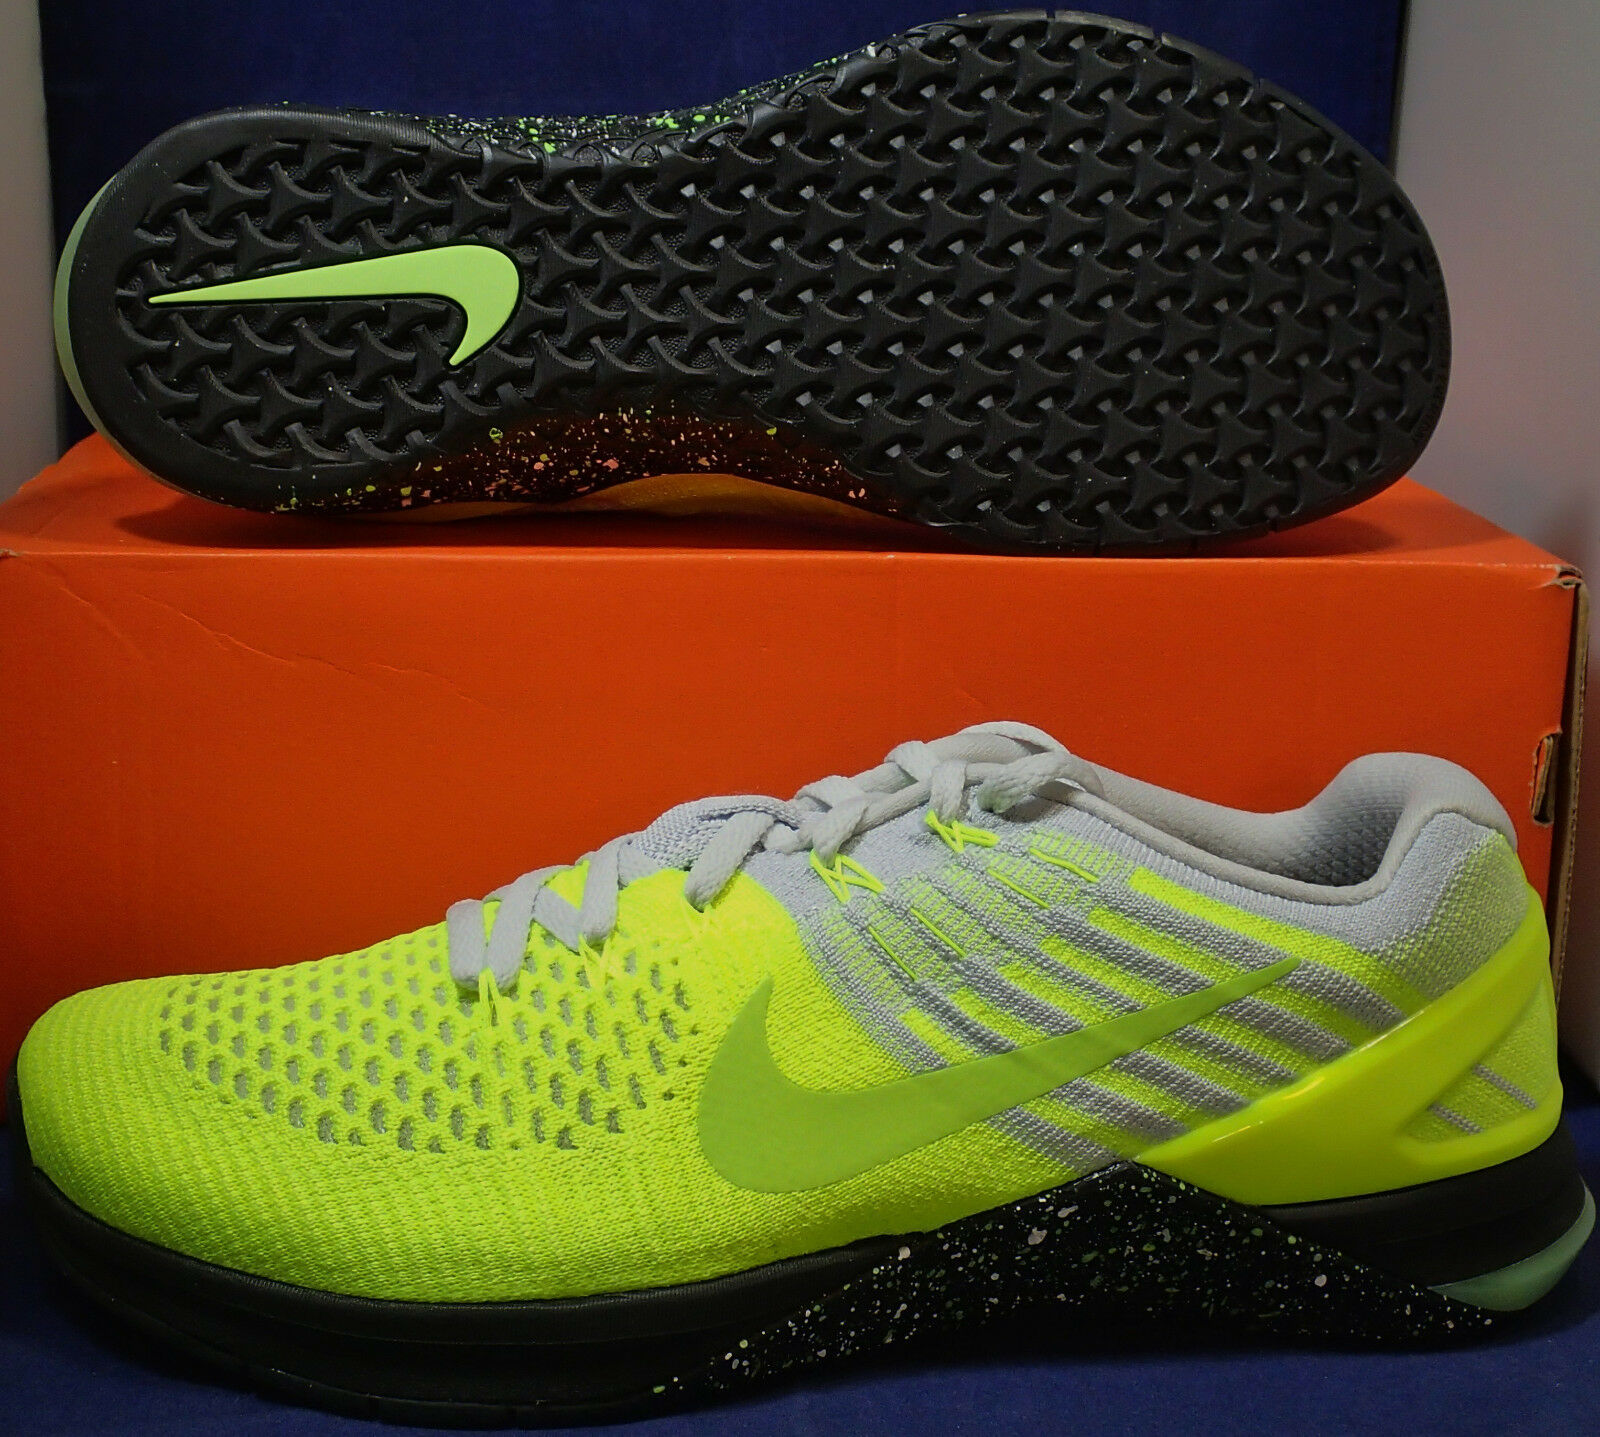 Nike Metcon Metcon Metcon 3 DSX Flyknit Volt Pure Platinum nero CrossFit SZ 9 ( 852930-701 ) 4bf09f